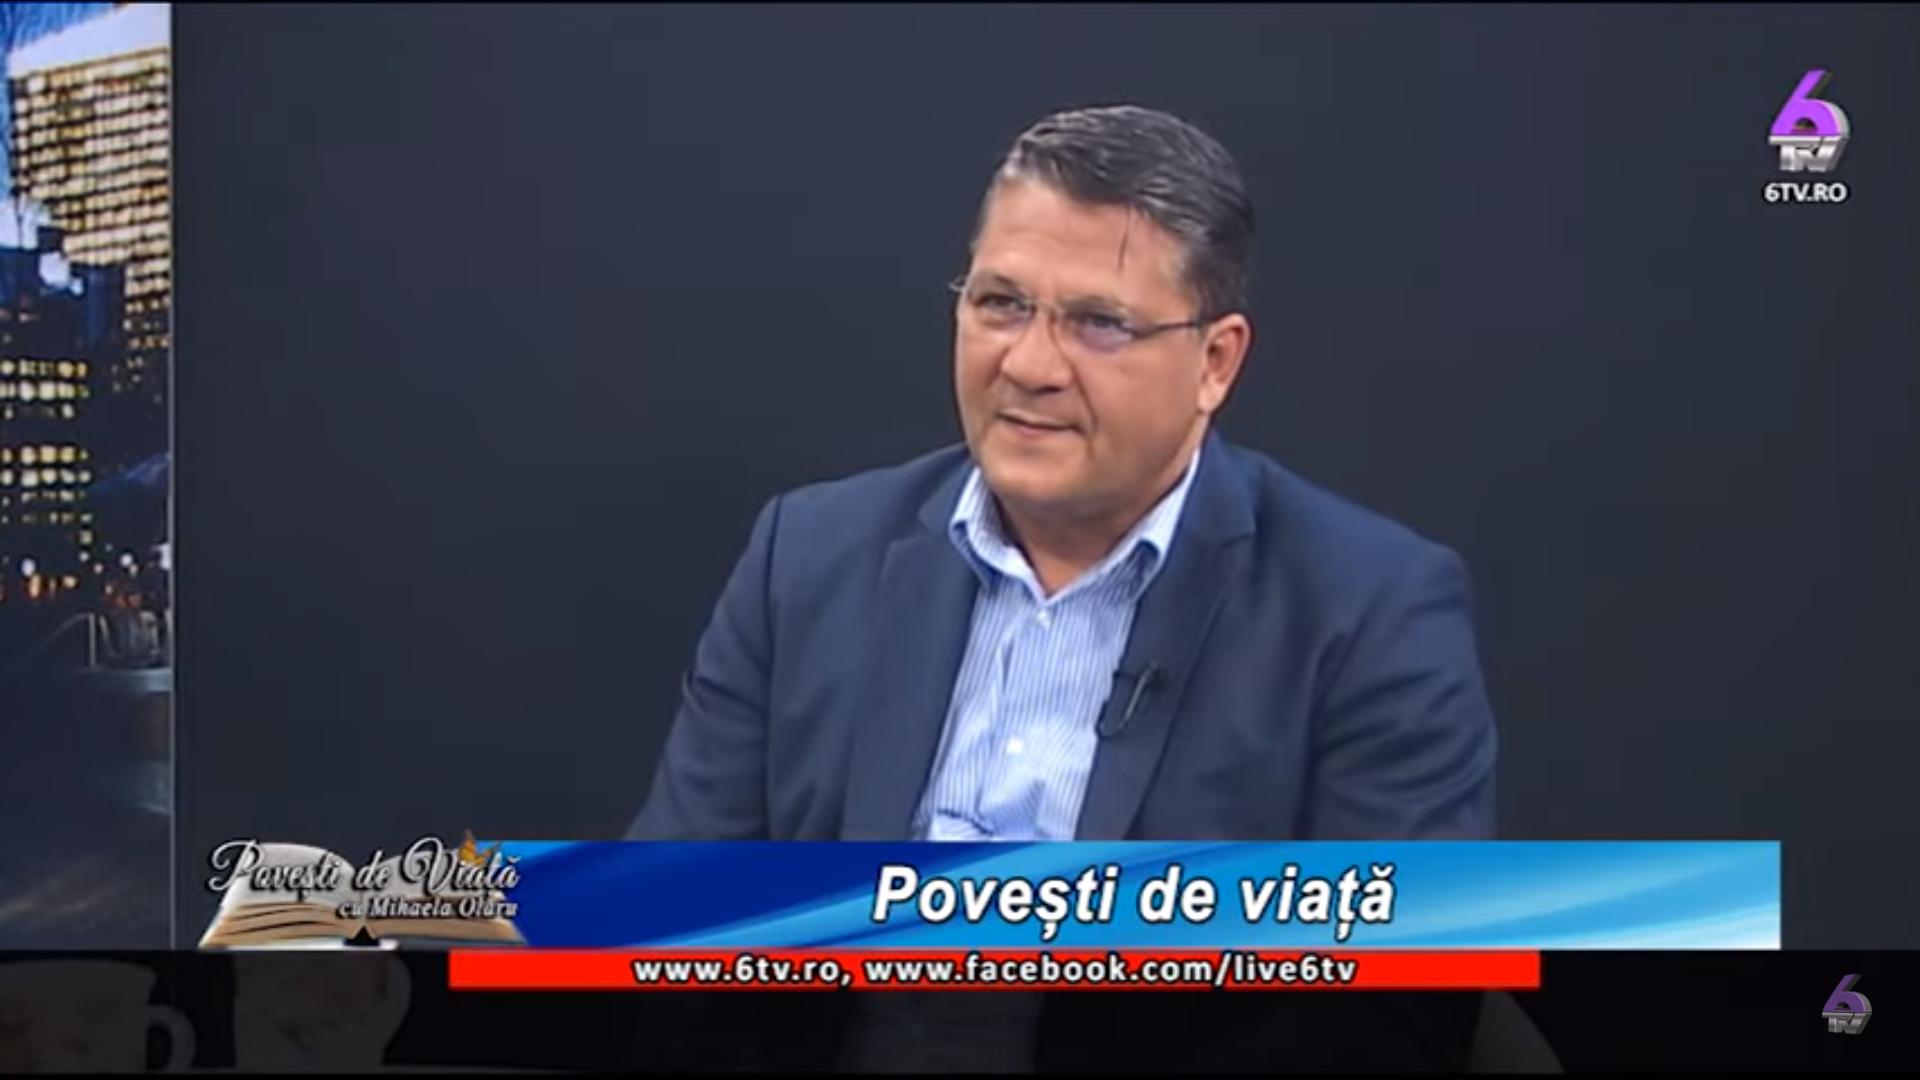 33. Actor - Director Teatru Excelsior - Adrian Găzdaru